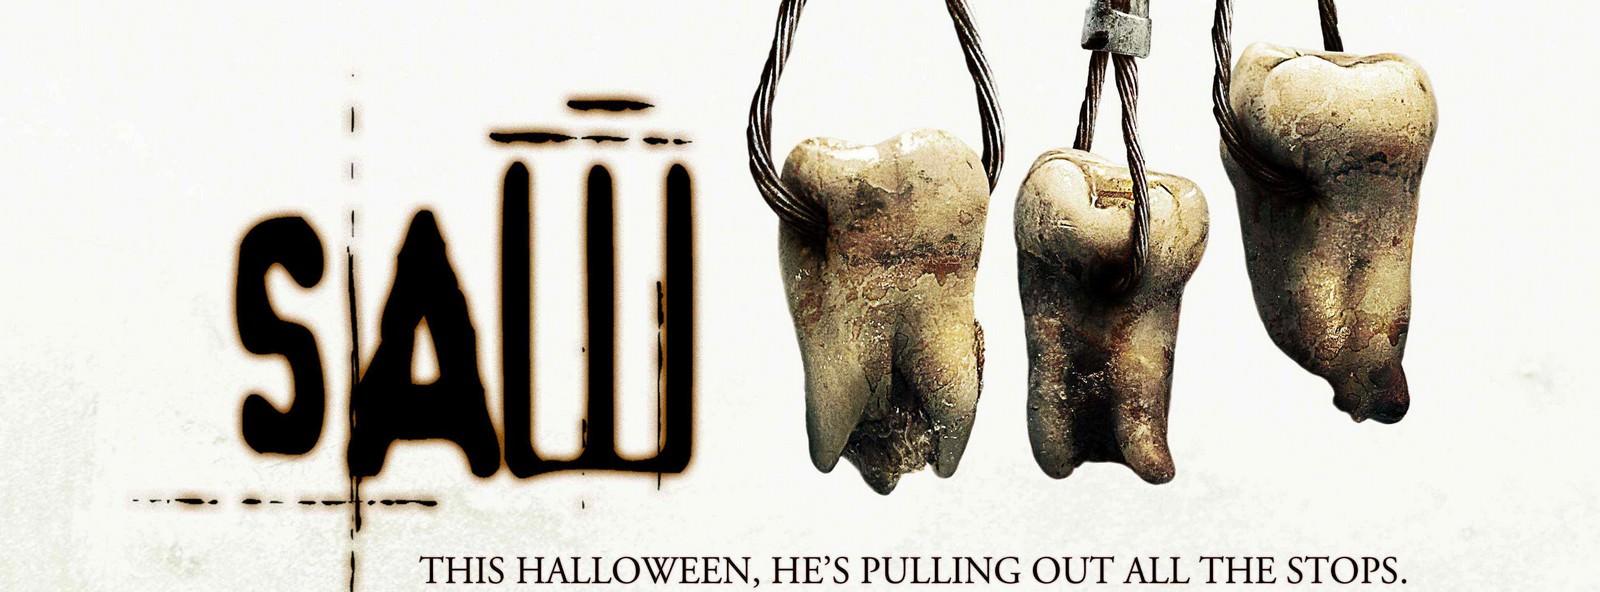 Movie, Saw III(美國, 2006年) / 奪魂鋸3(台灣) / 恐懼鬥室3:死神在齒(香港) / 电锯惊魂3(網路), 電影海報, 美國, 橫版